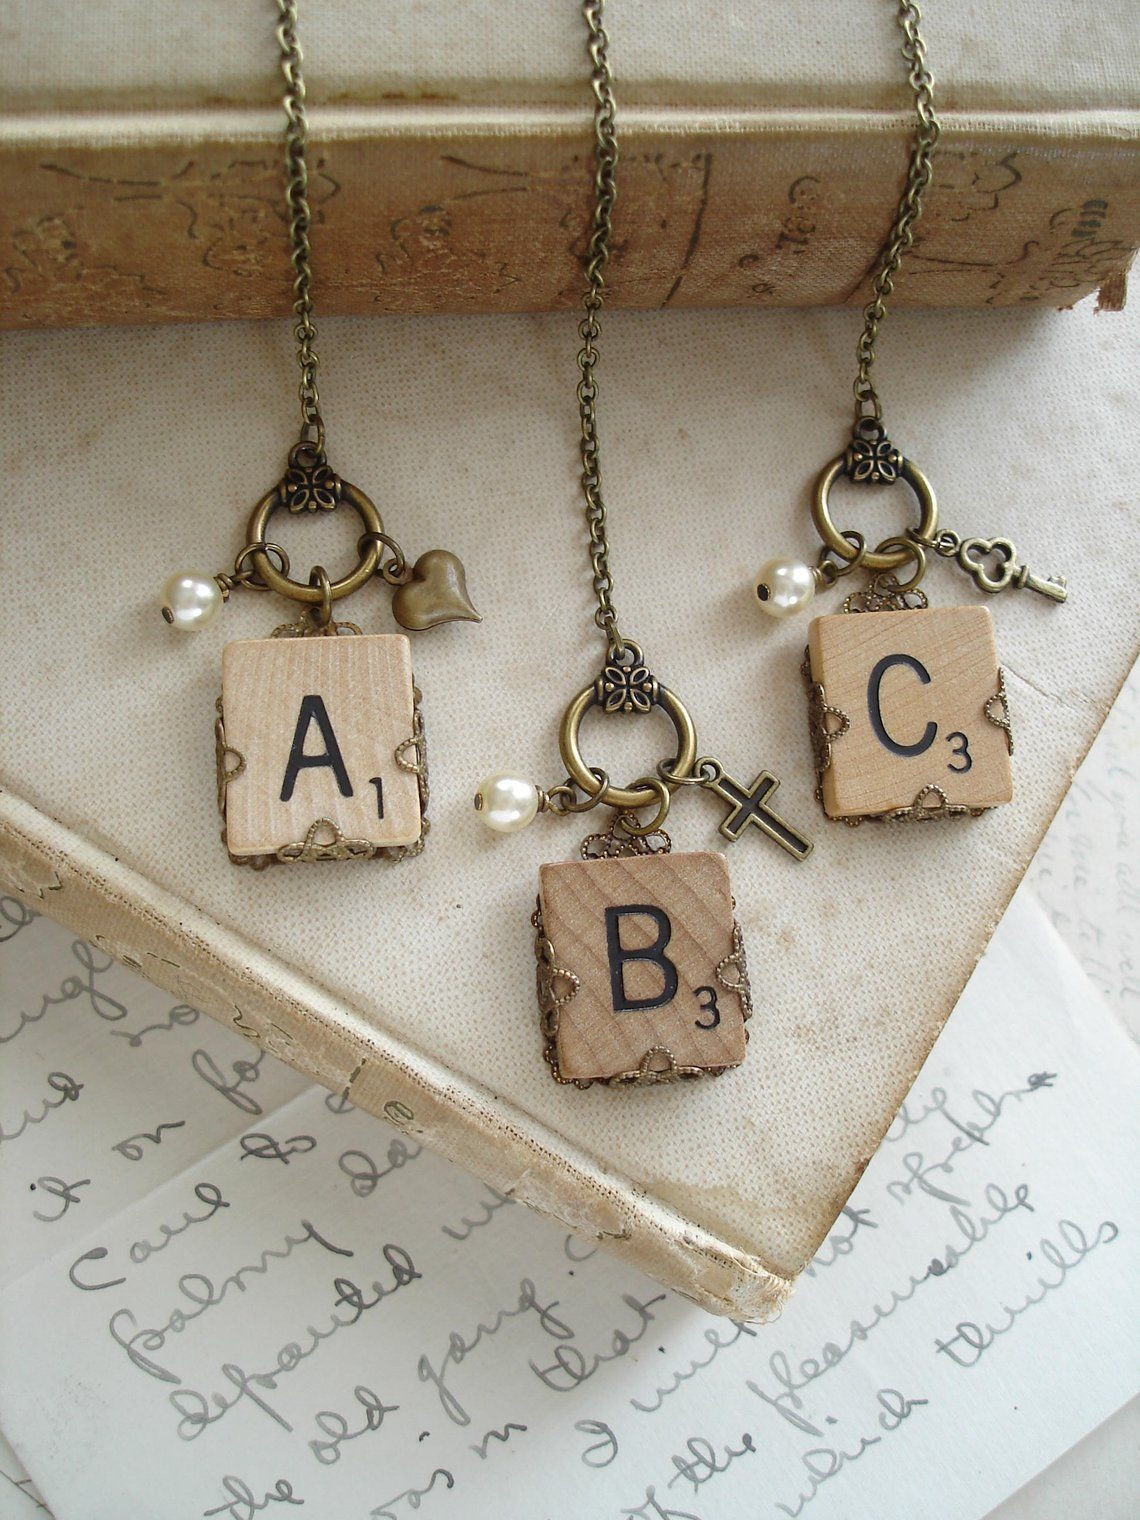 12+ Letter n necklace images inspirations